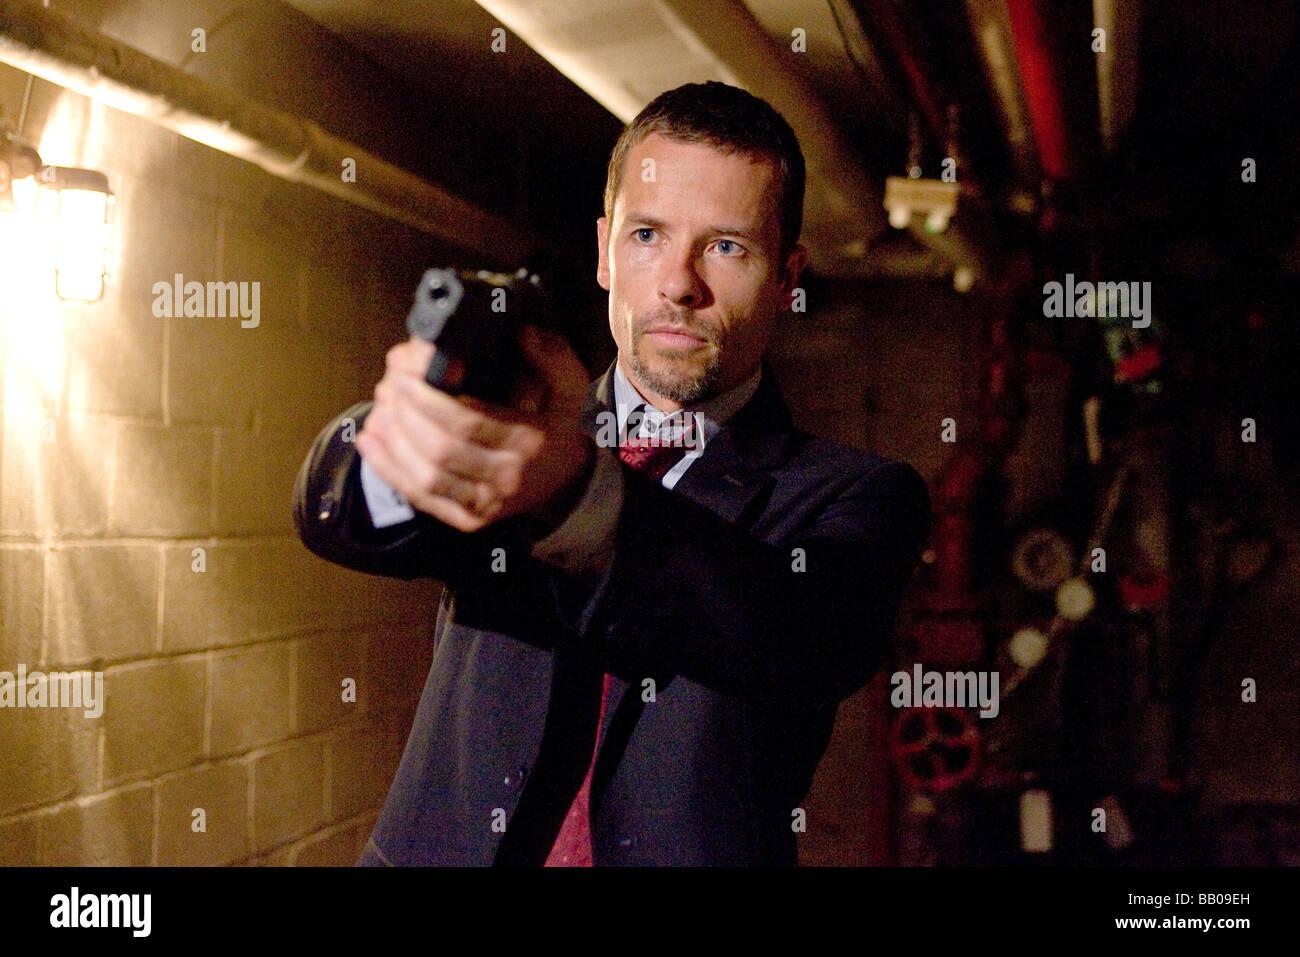 Traitor Year : 2009 Director : Jeffrey Nachmanoff Guy Pearce - Stock Image